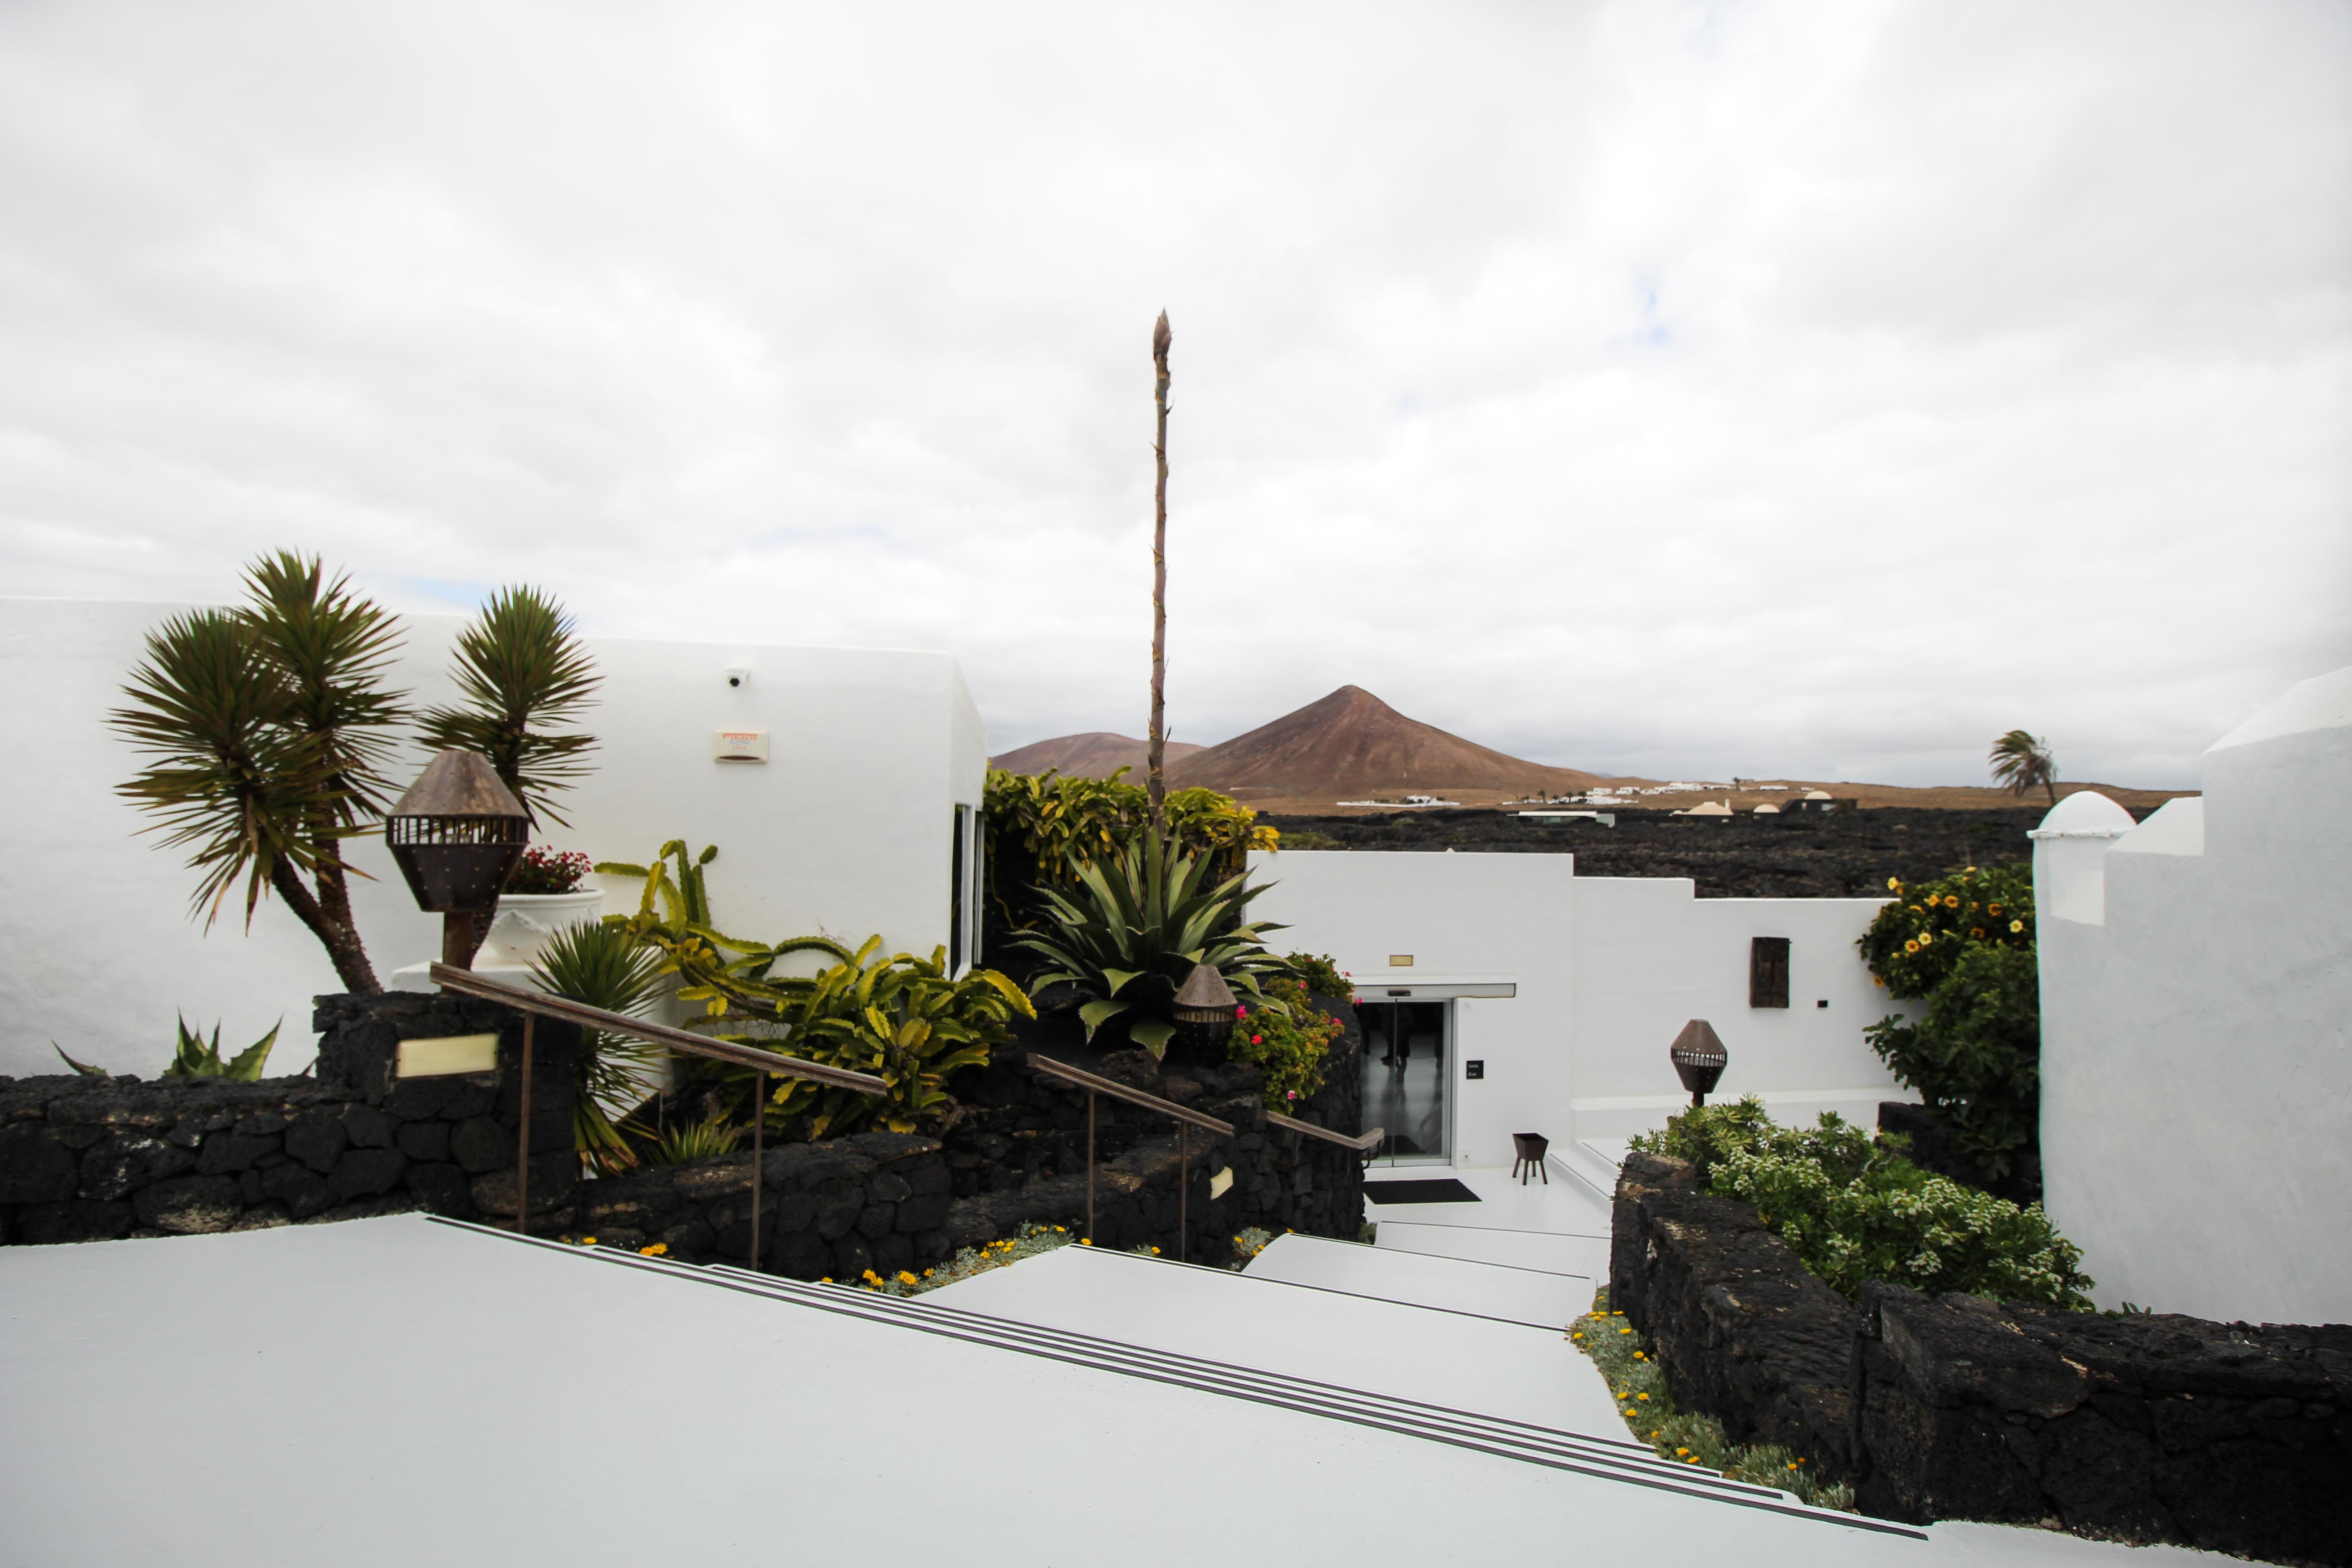 Top 10 Tipps Lanzarote Sehenswürdigkeiten Insider Tipps Lanzarote Spanien Fundación César Manrique Haus Reiseblog